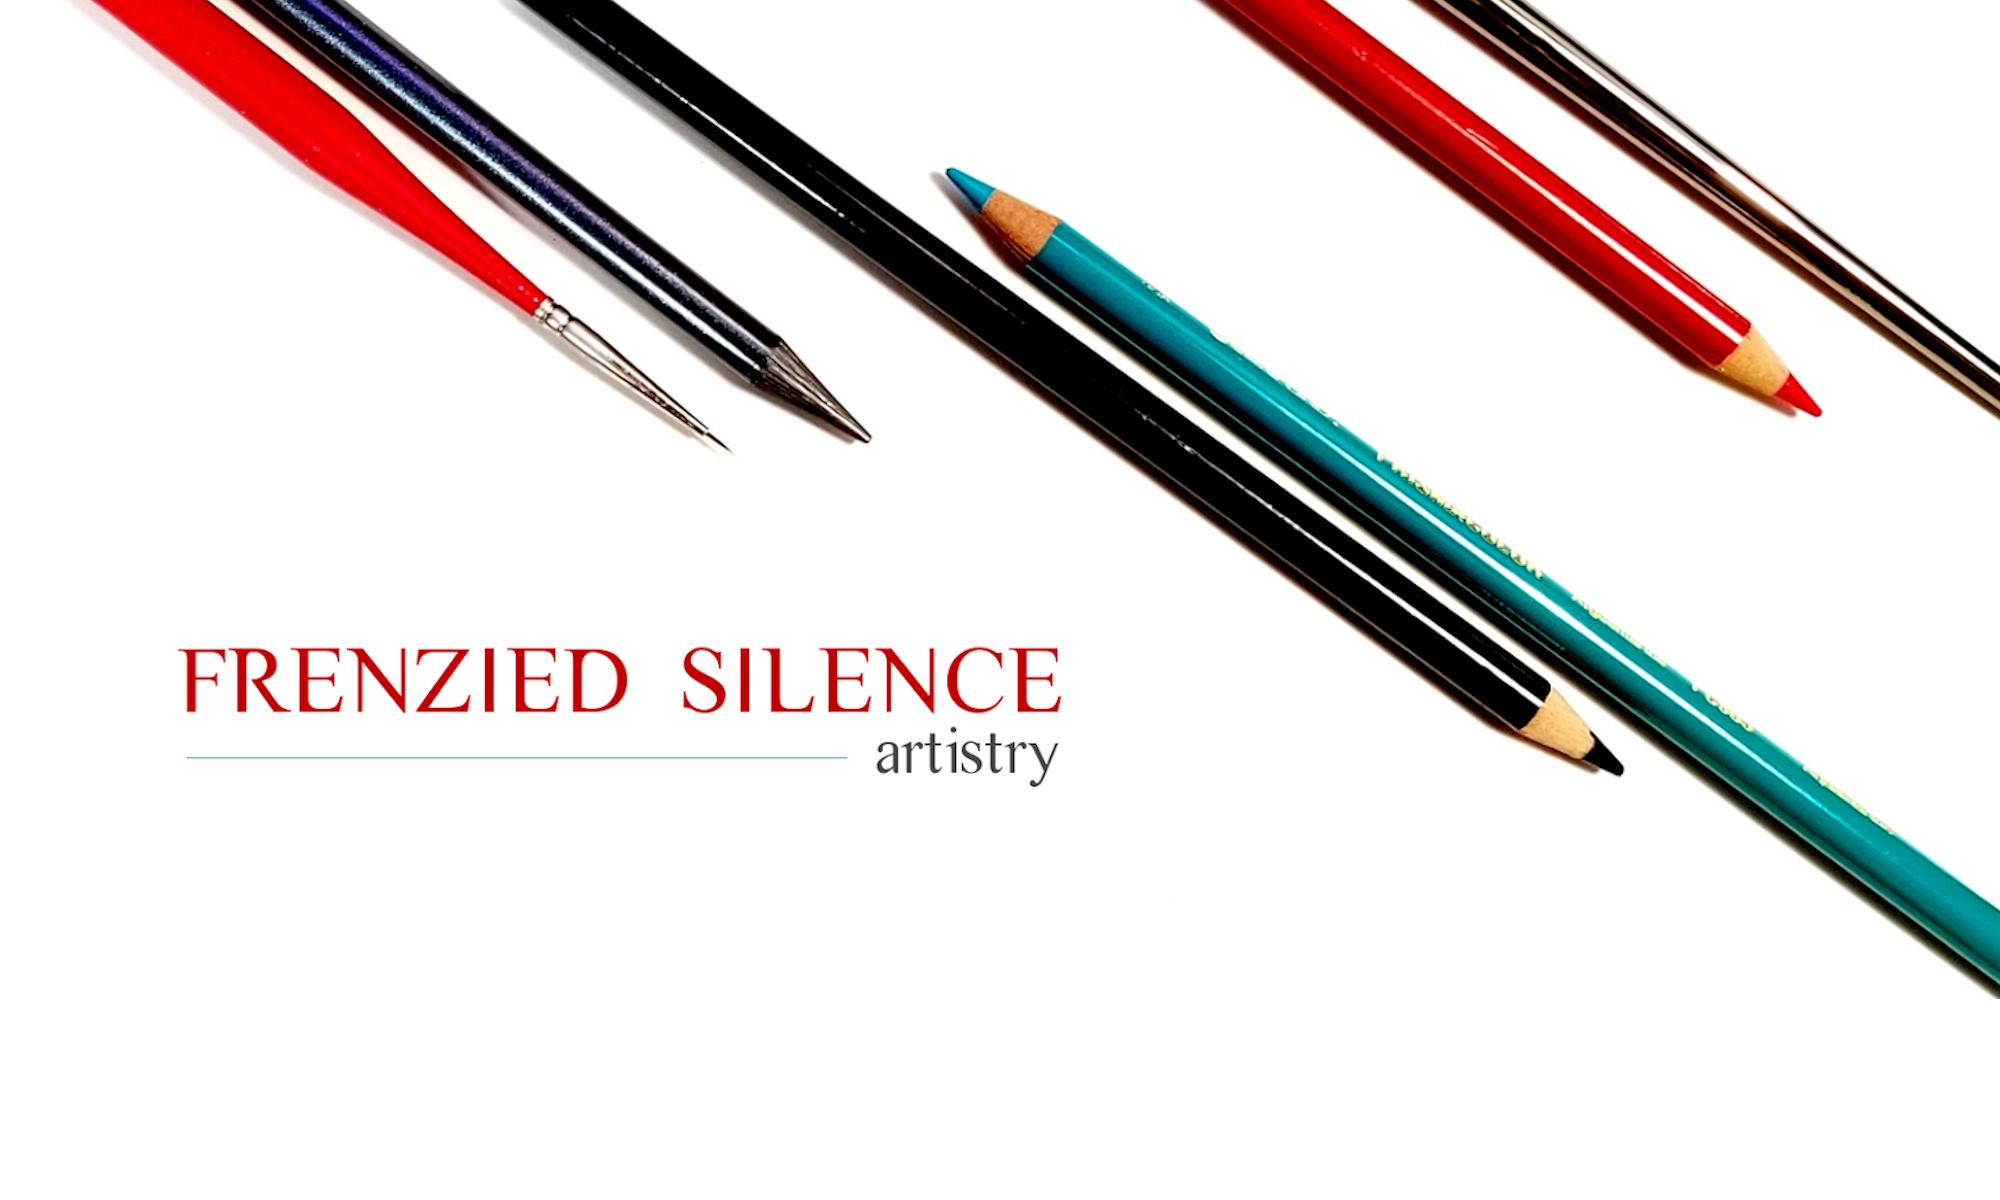 Frenzied Silence Artistry